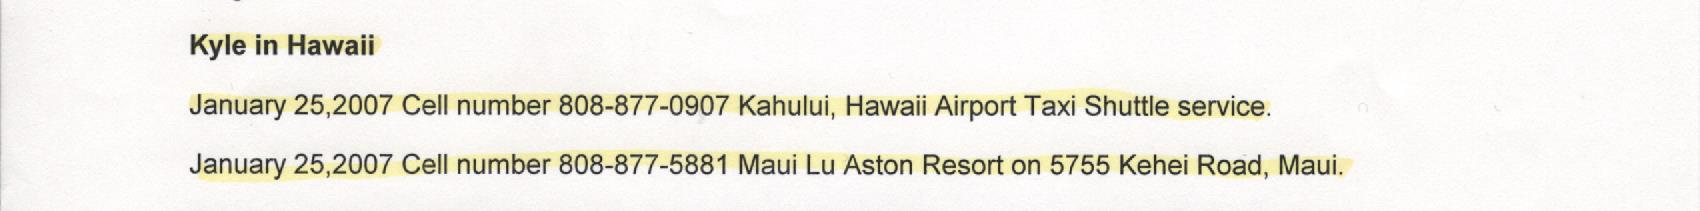 Kyle in Hawaii 001